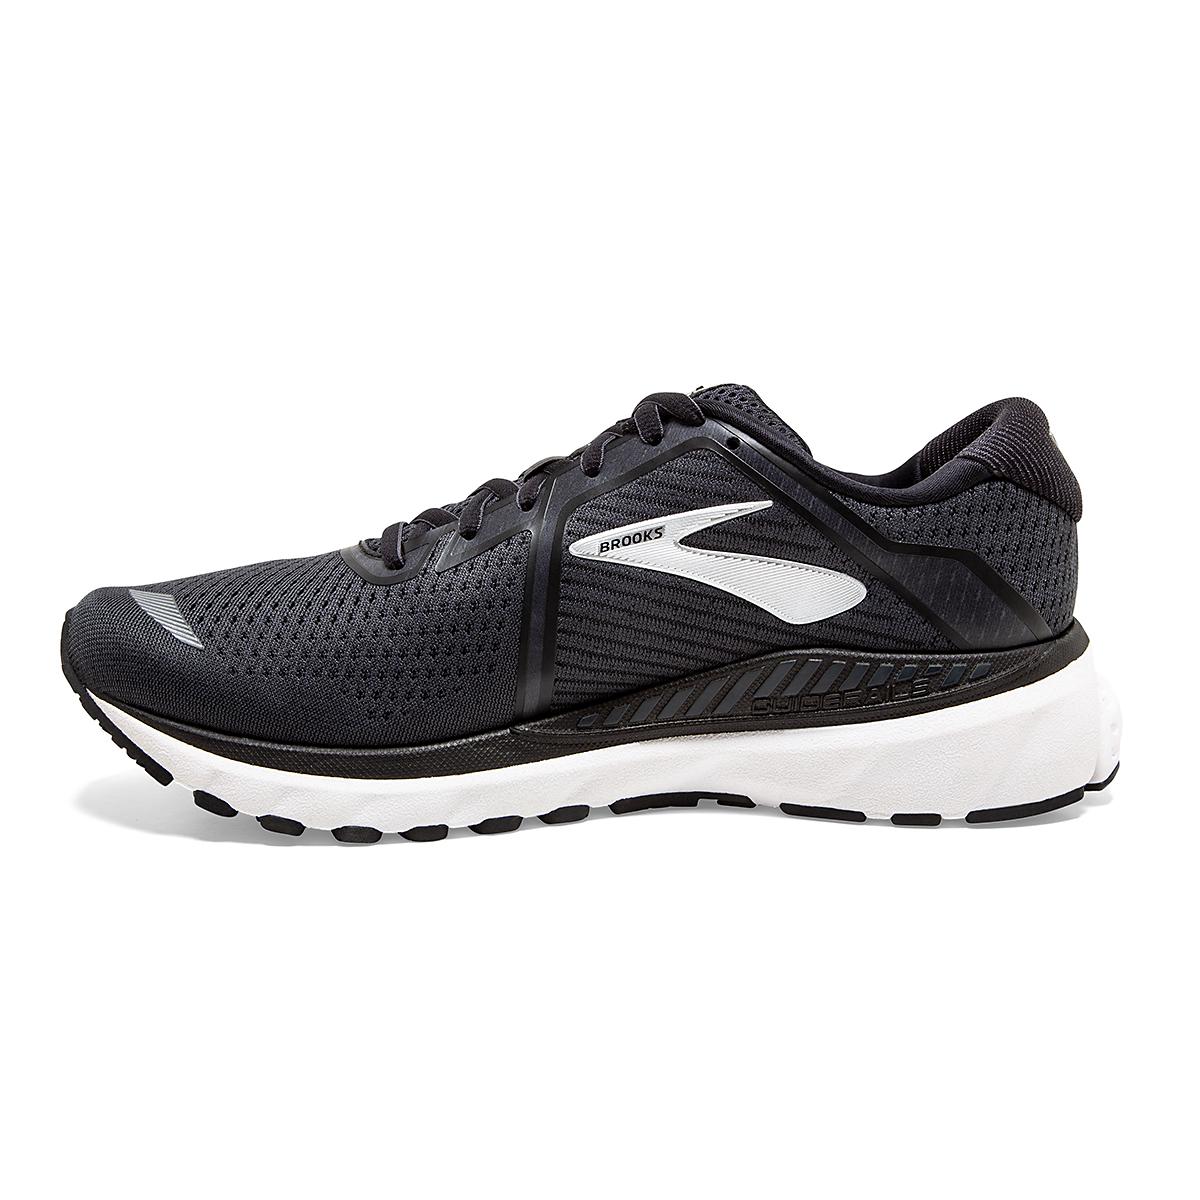 Men's Brooks Adrenaline GTS 20 Running Shoe - Color: Black/Grey/Ebony - Size: 7 - Width: Regular, Black/Grey/Ebony, large, image 2